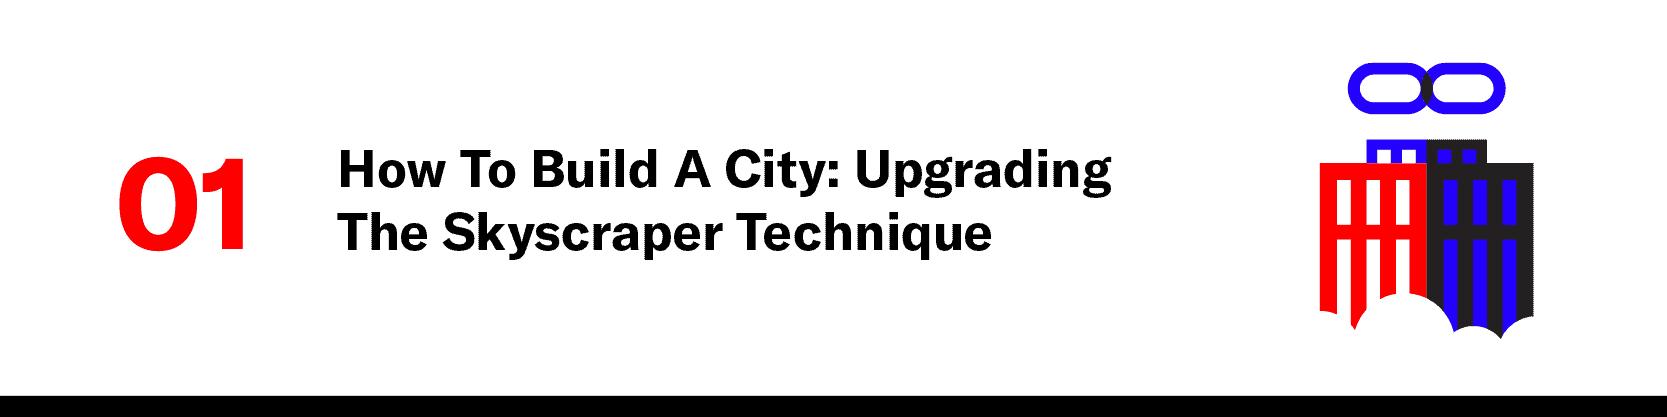 skyscraper chapter